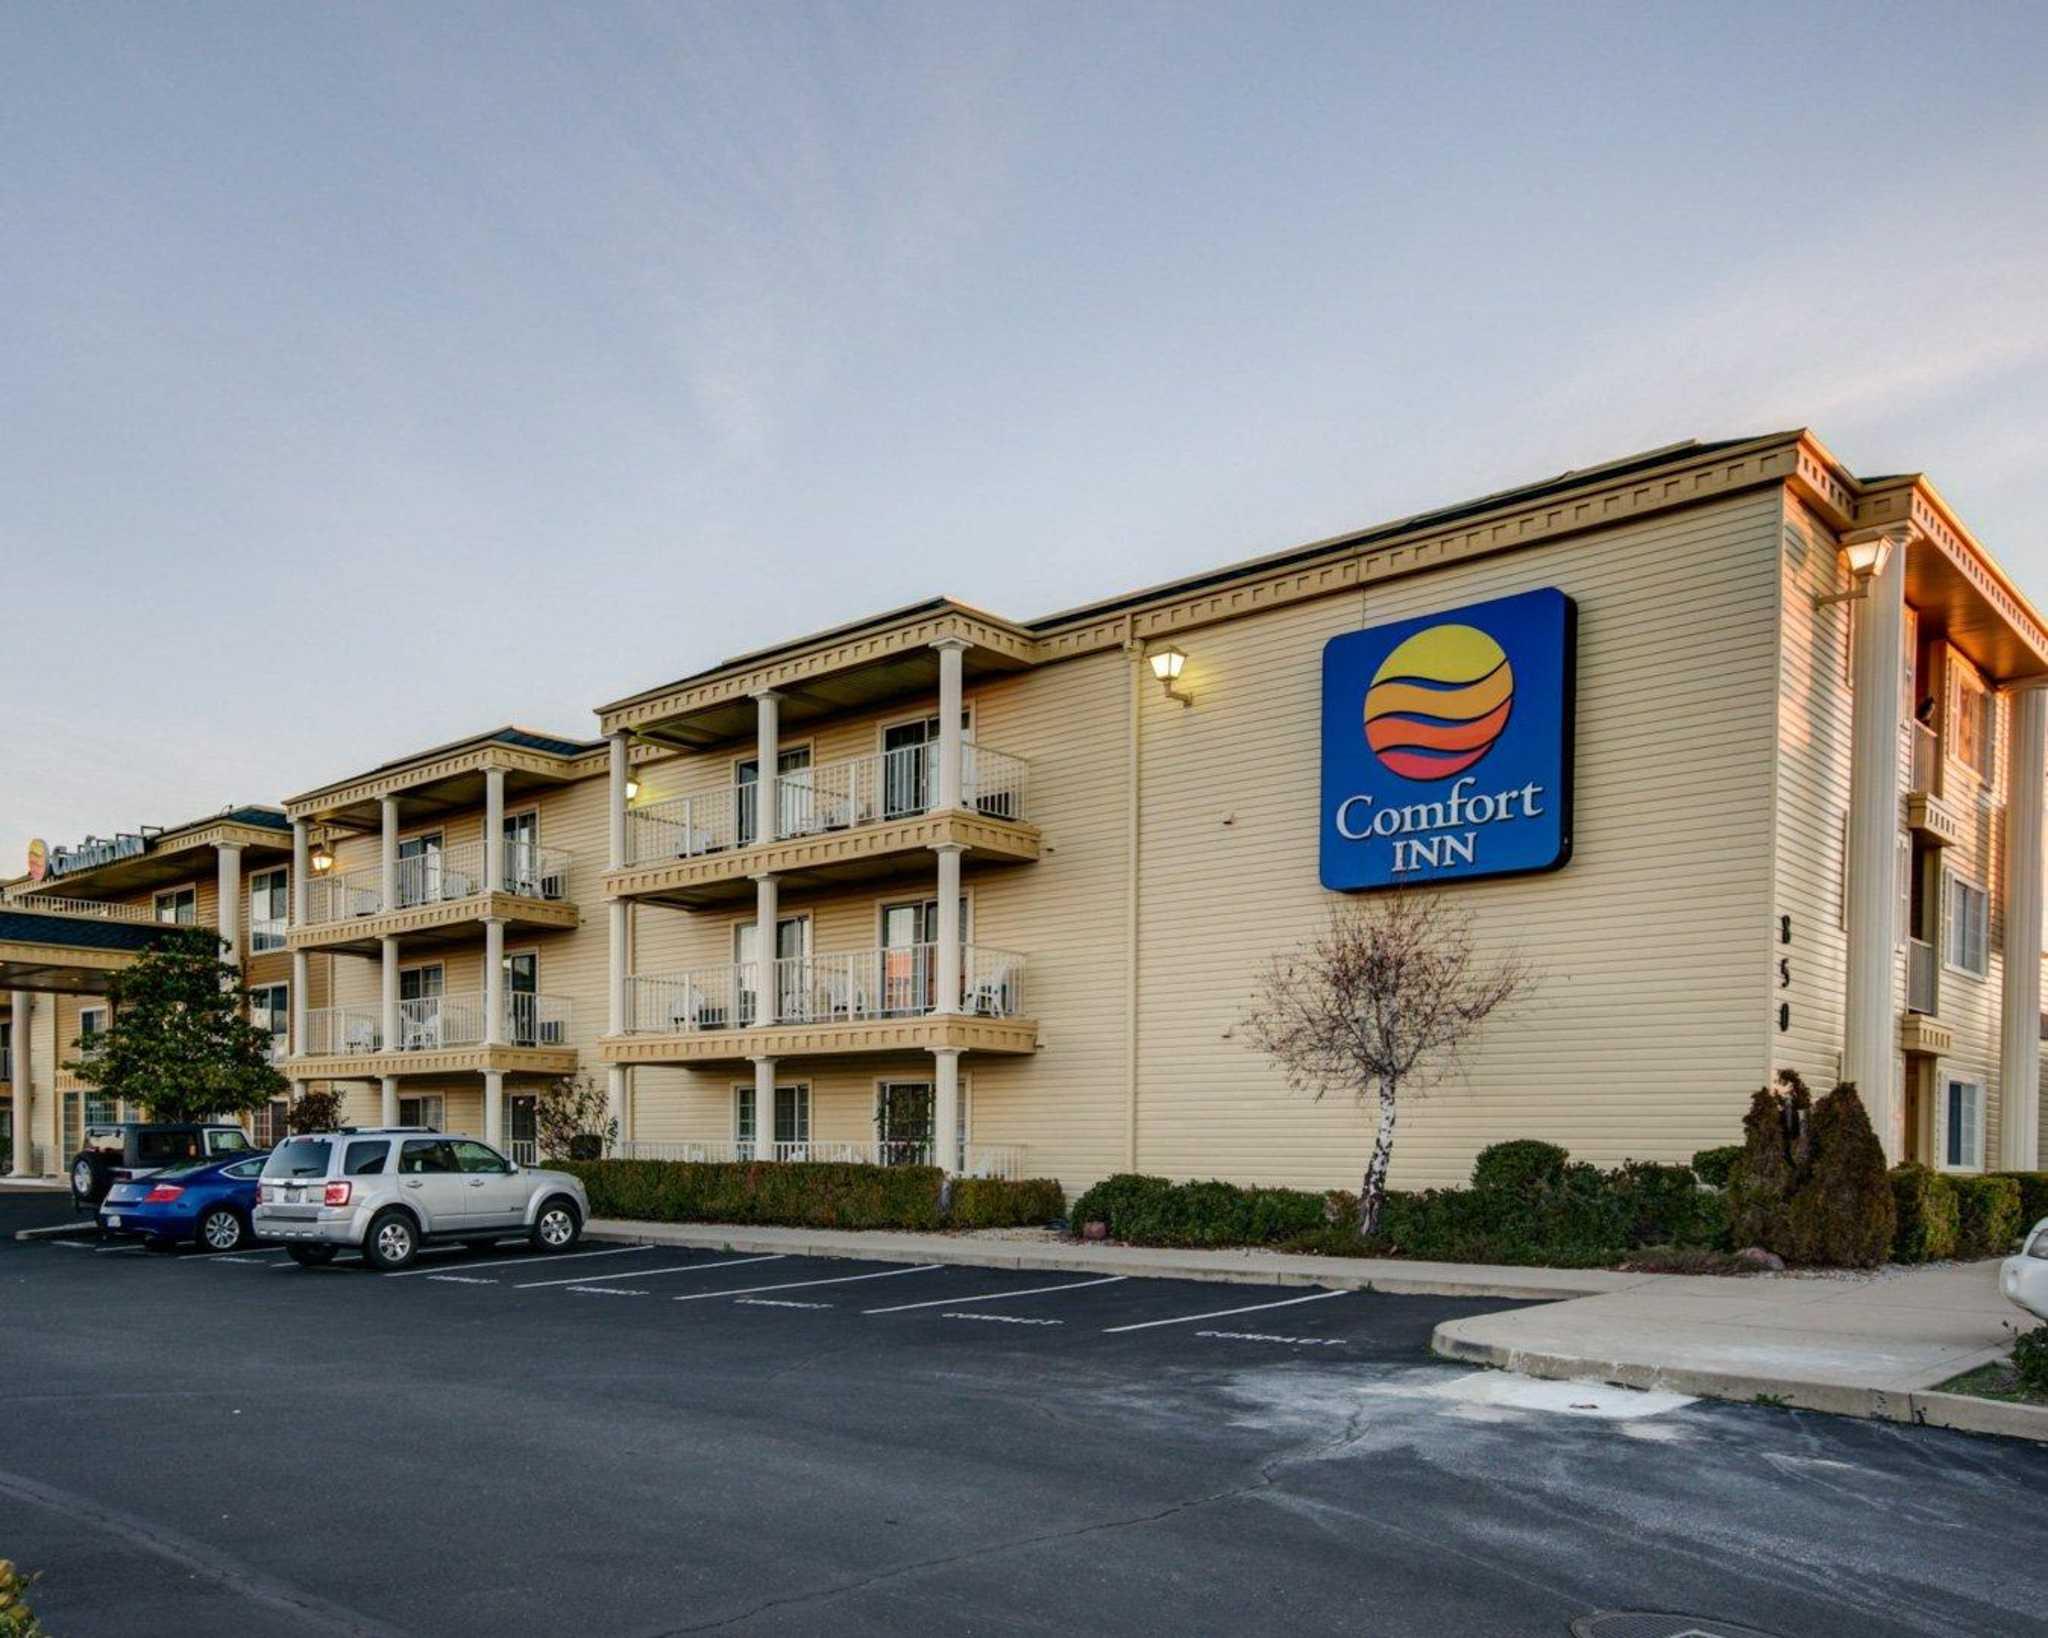 Hotel Rooms In Redding Ca